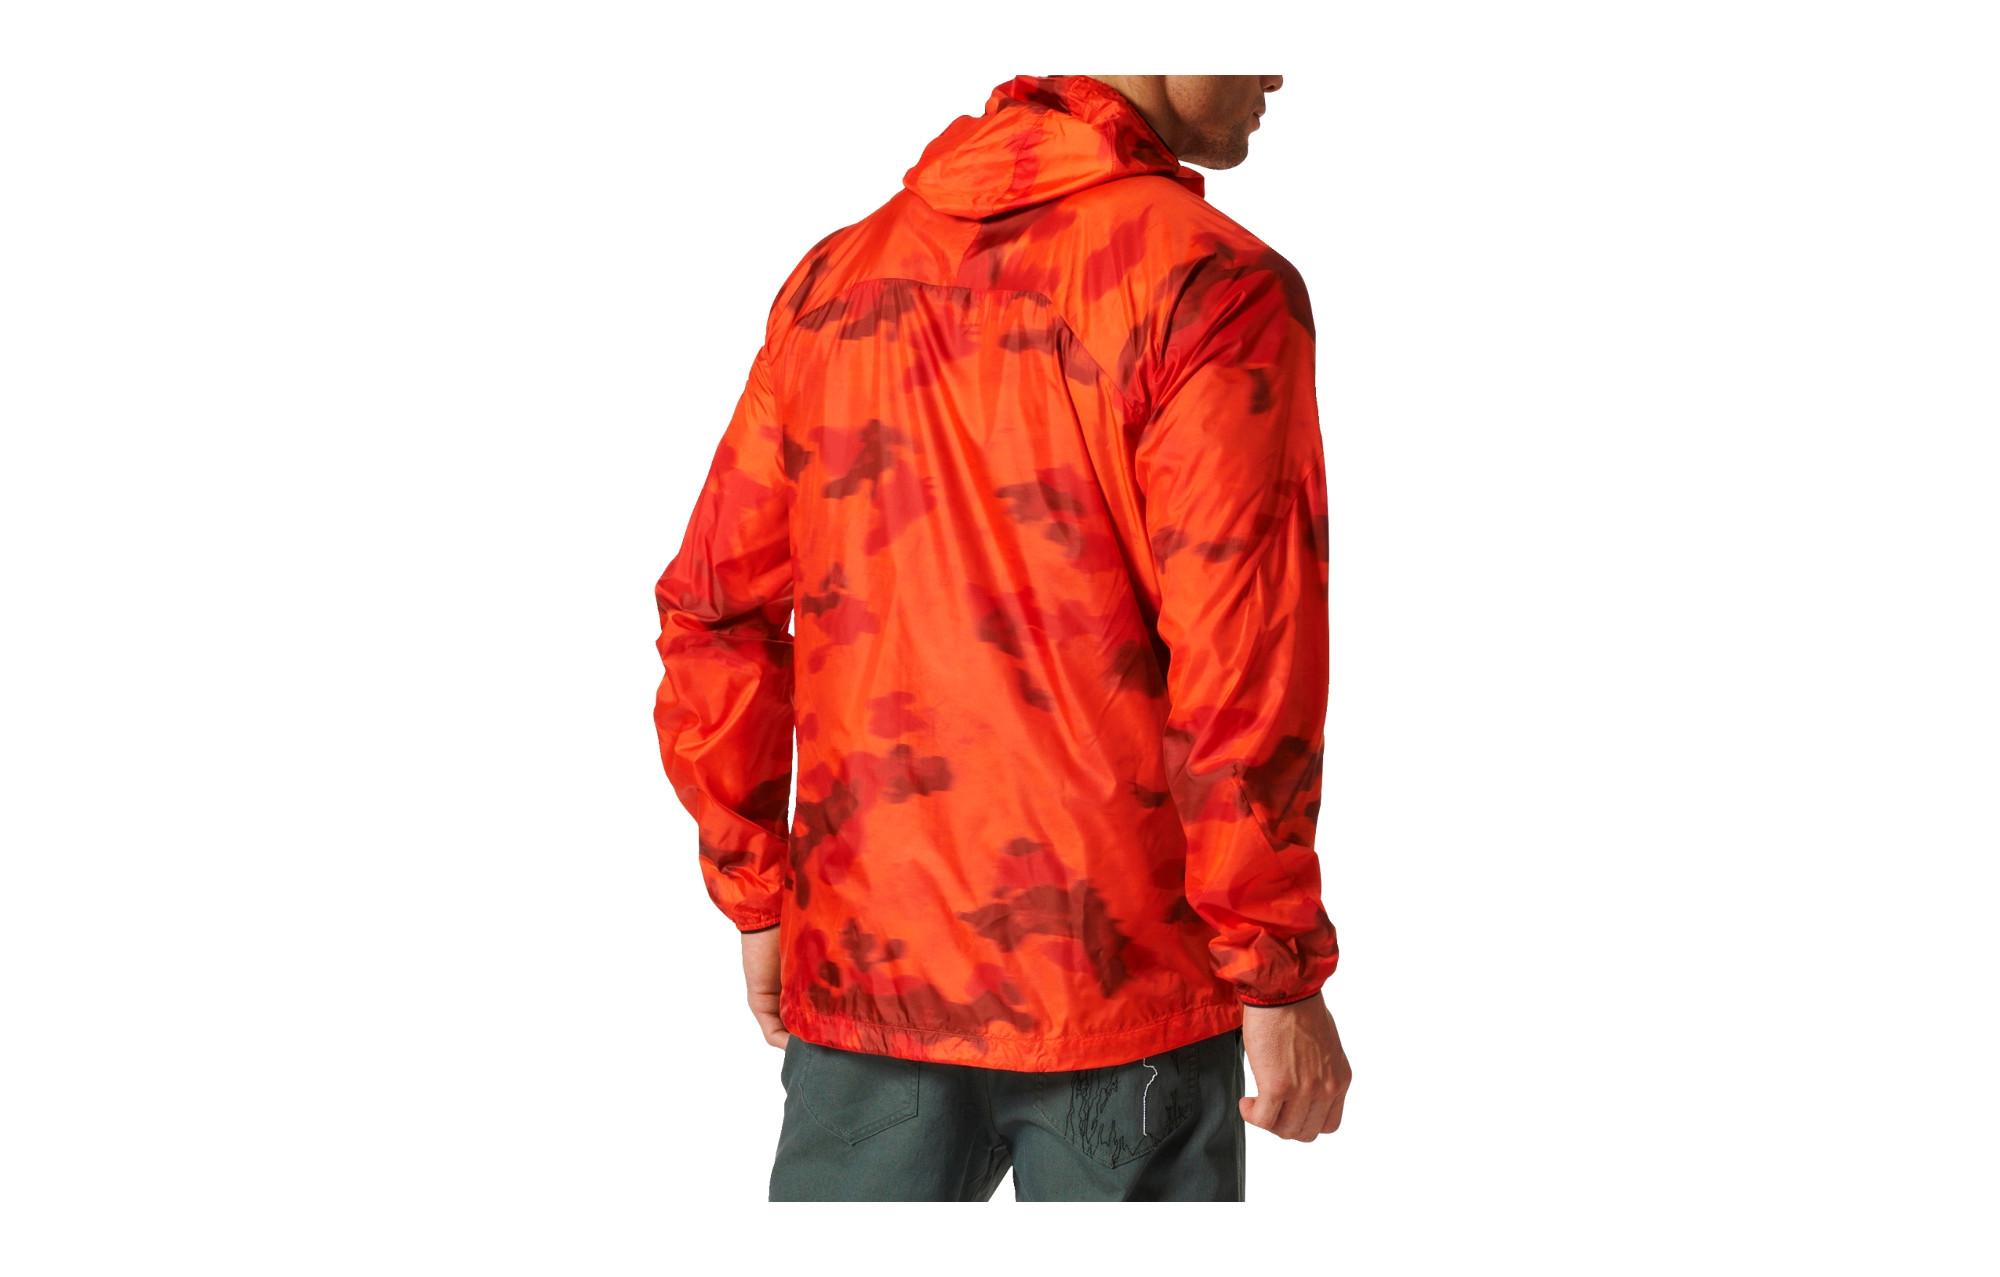 Adidas Running Waterproof Jacket Terrex Agravic Orange